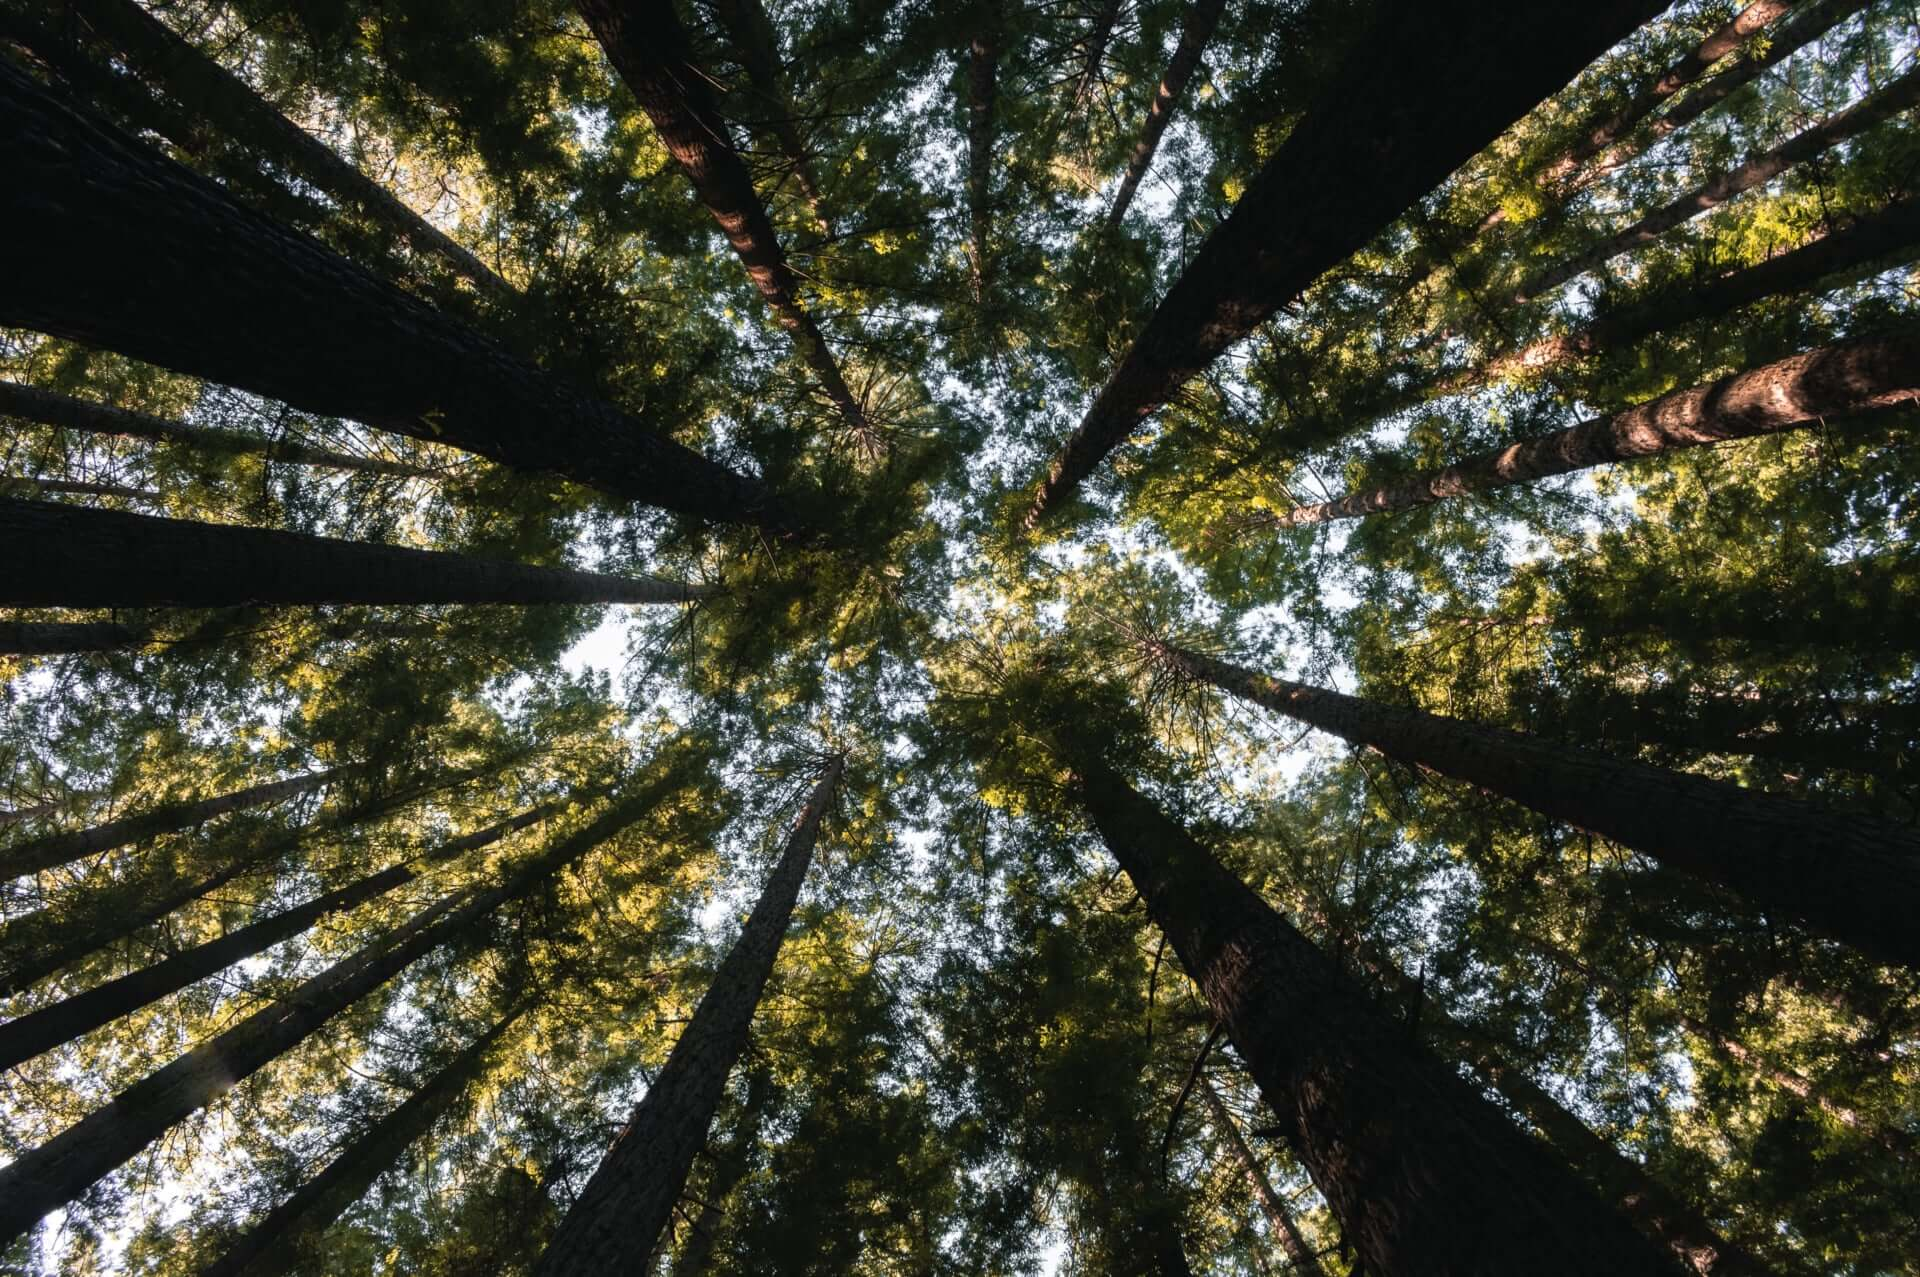 Apple CEOティム・クック、アマゾン熱帯雨林の火災を受けて寄付を宣言|ディカプリオらも寄付 tech190827_apple_amazon_main-1920x1277